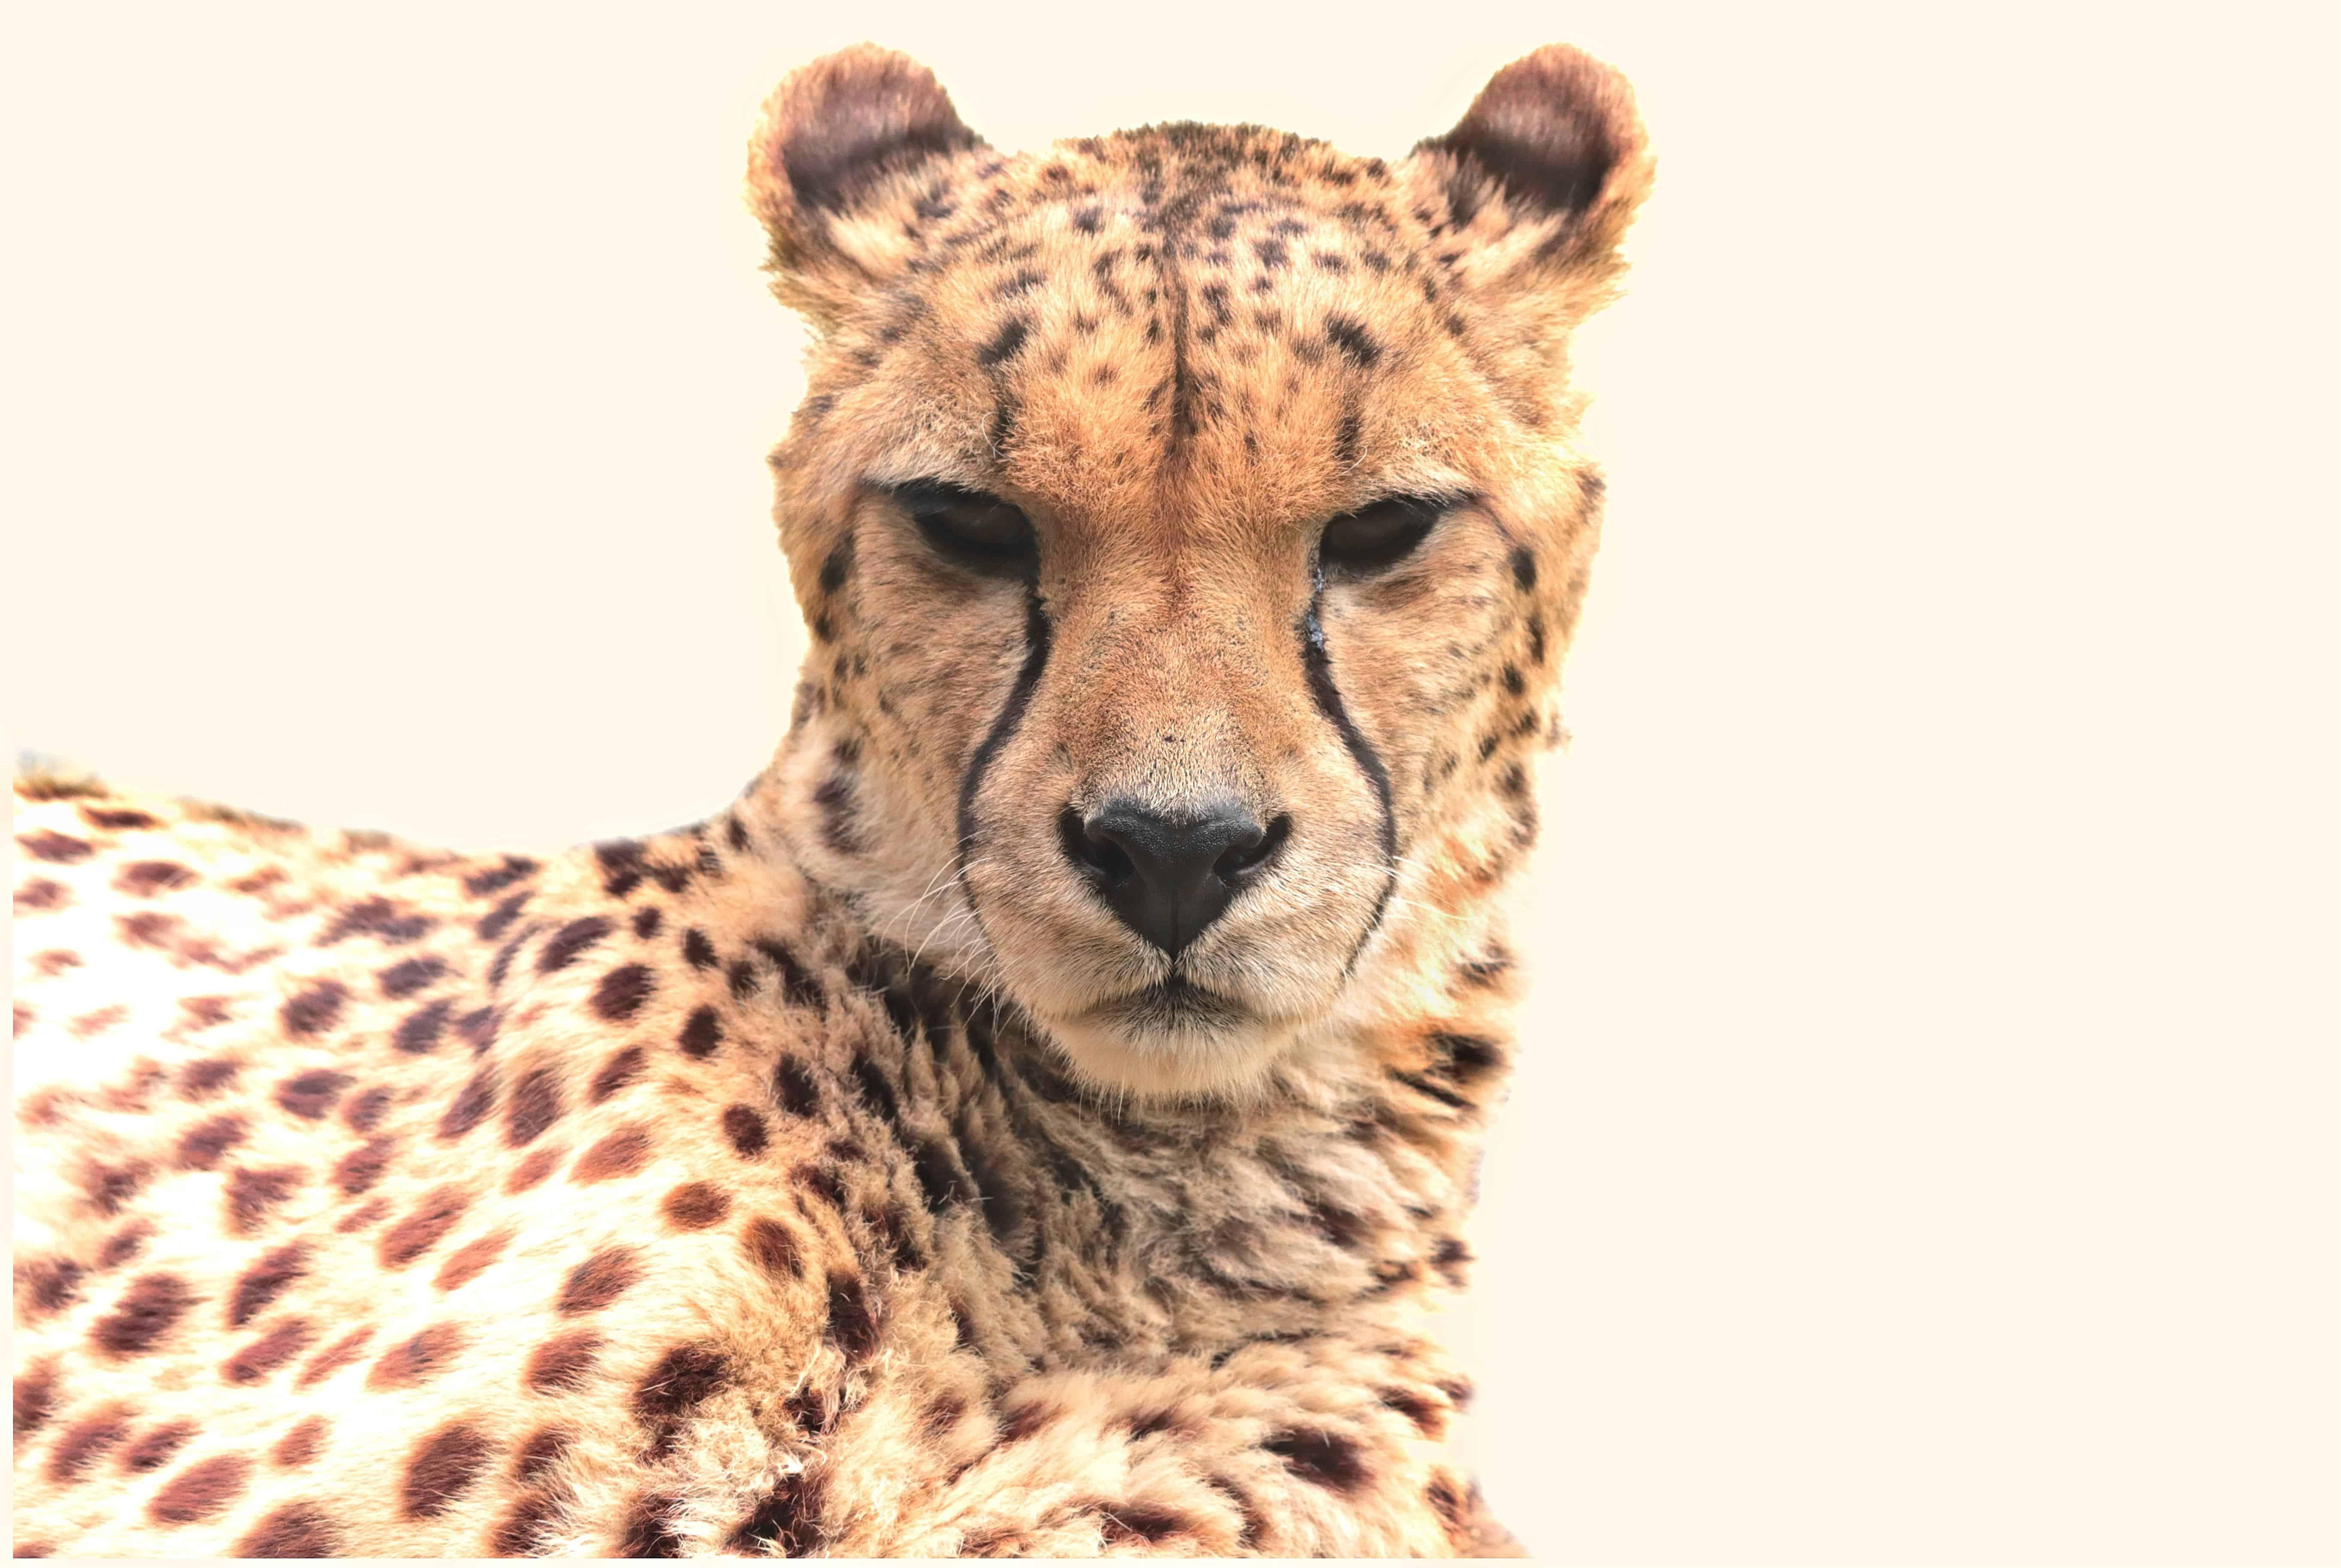 морда леопарда фото рисунок настолько прекрасна